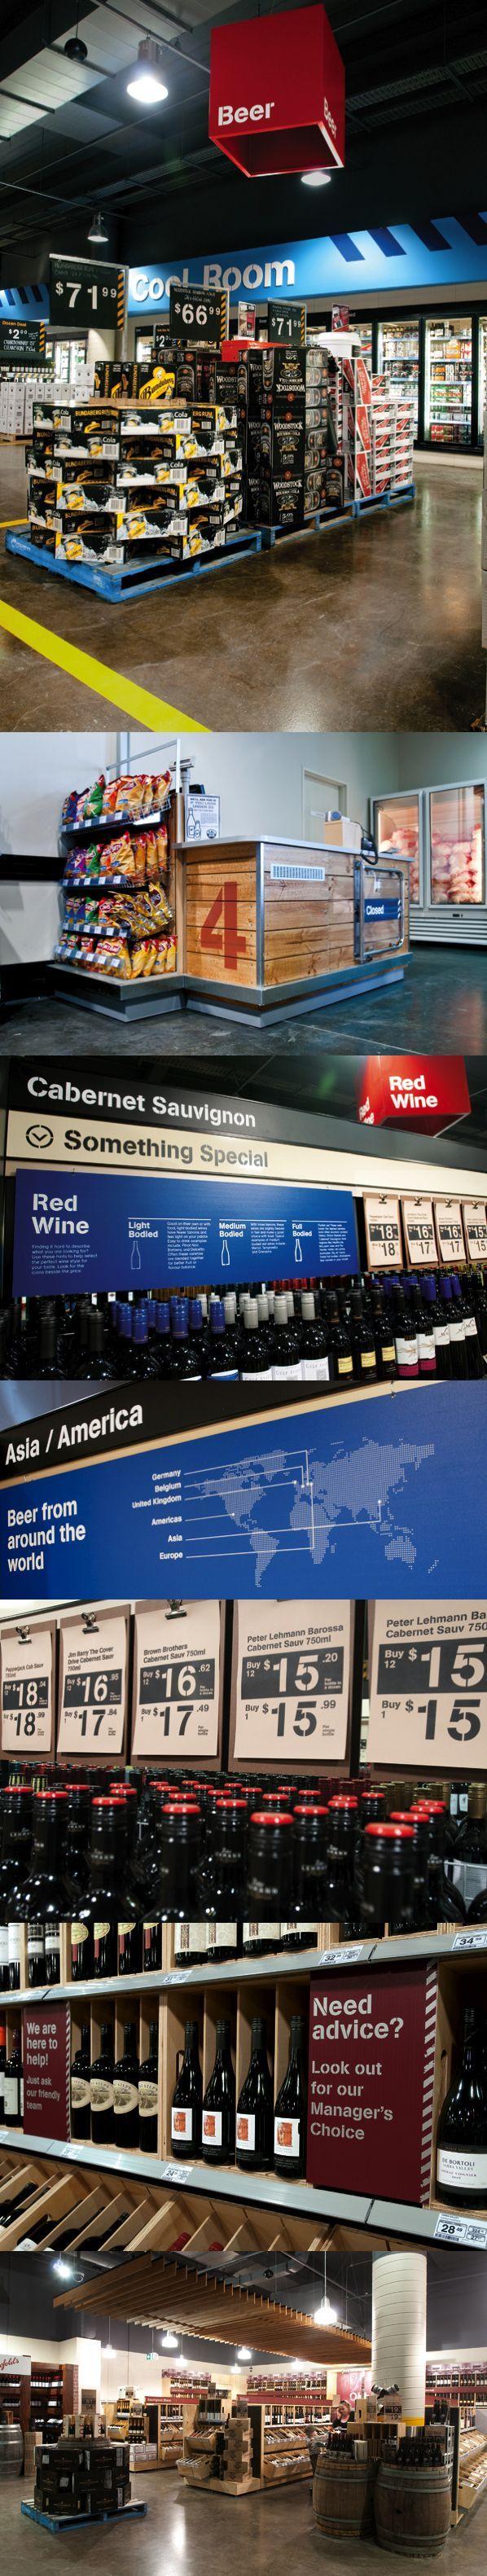 Booze signposting Supermarket design, Liquor store